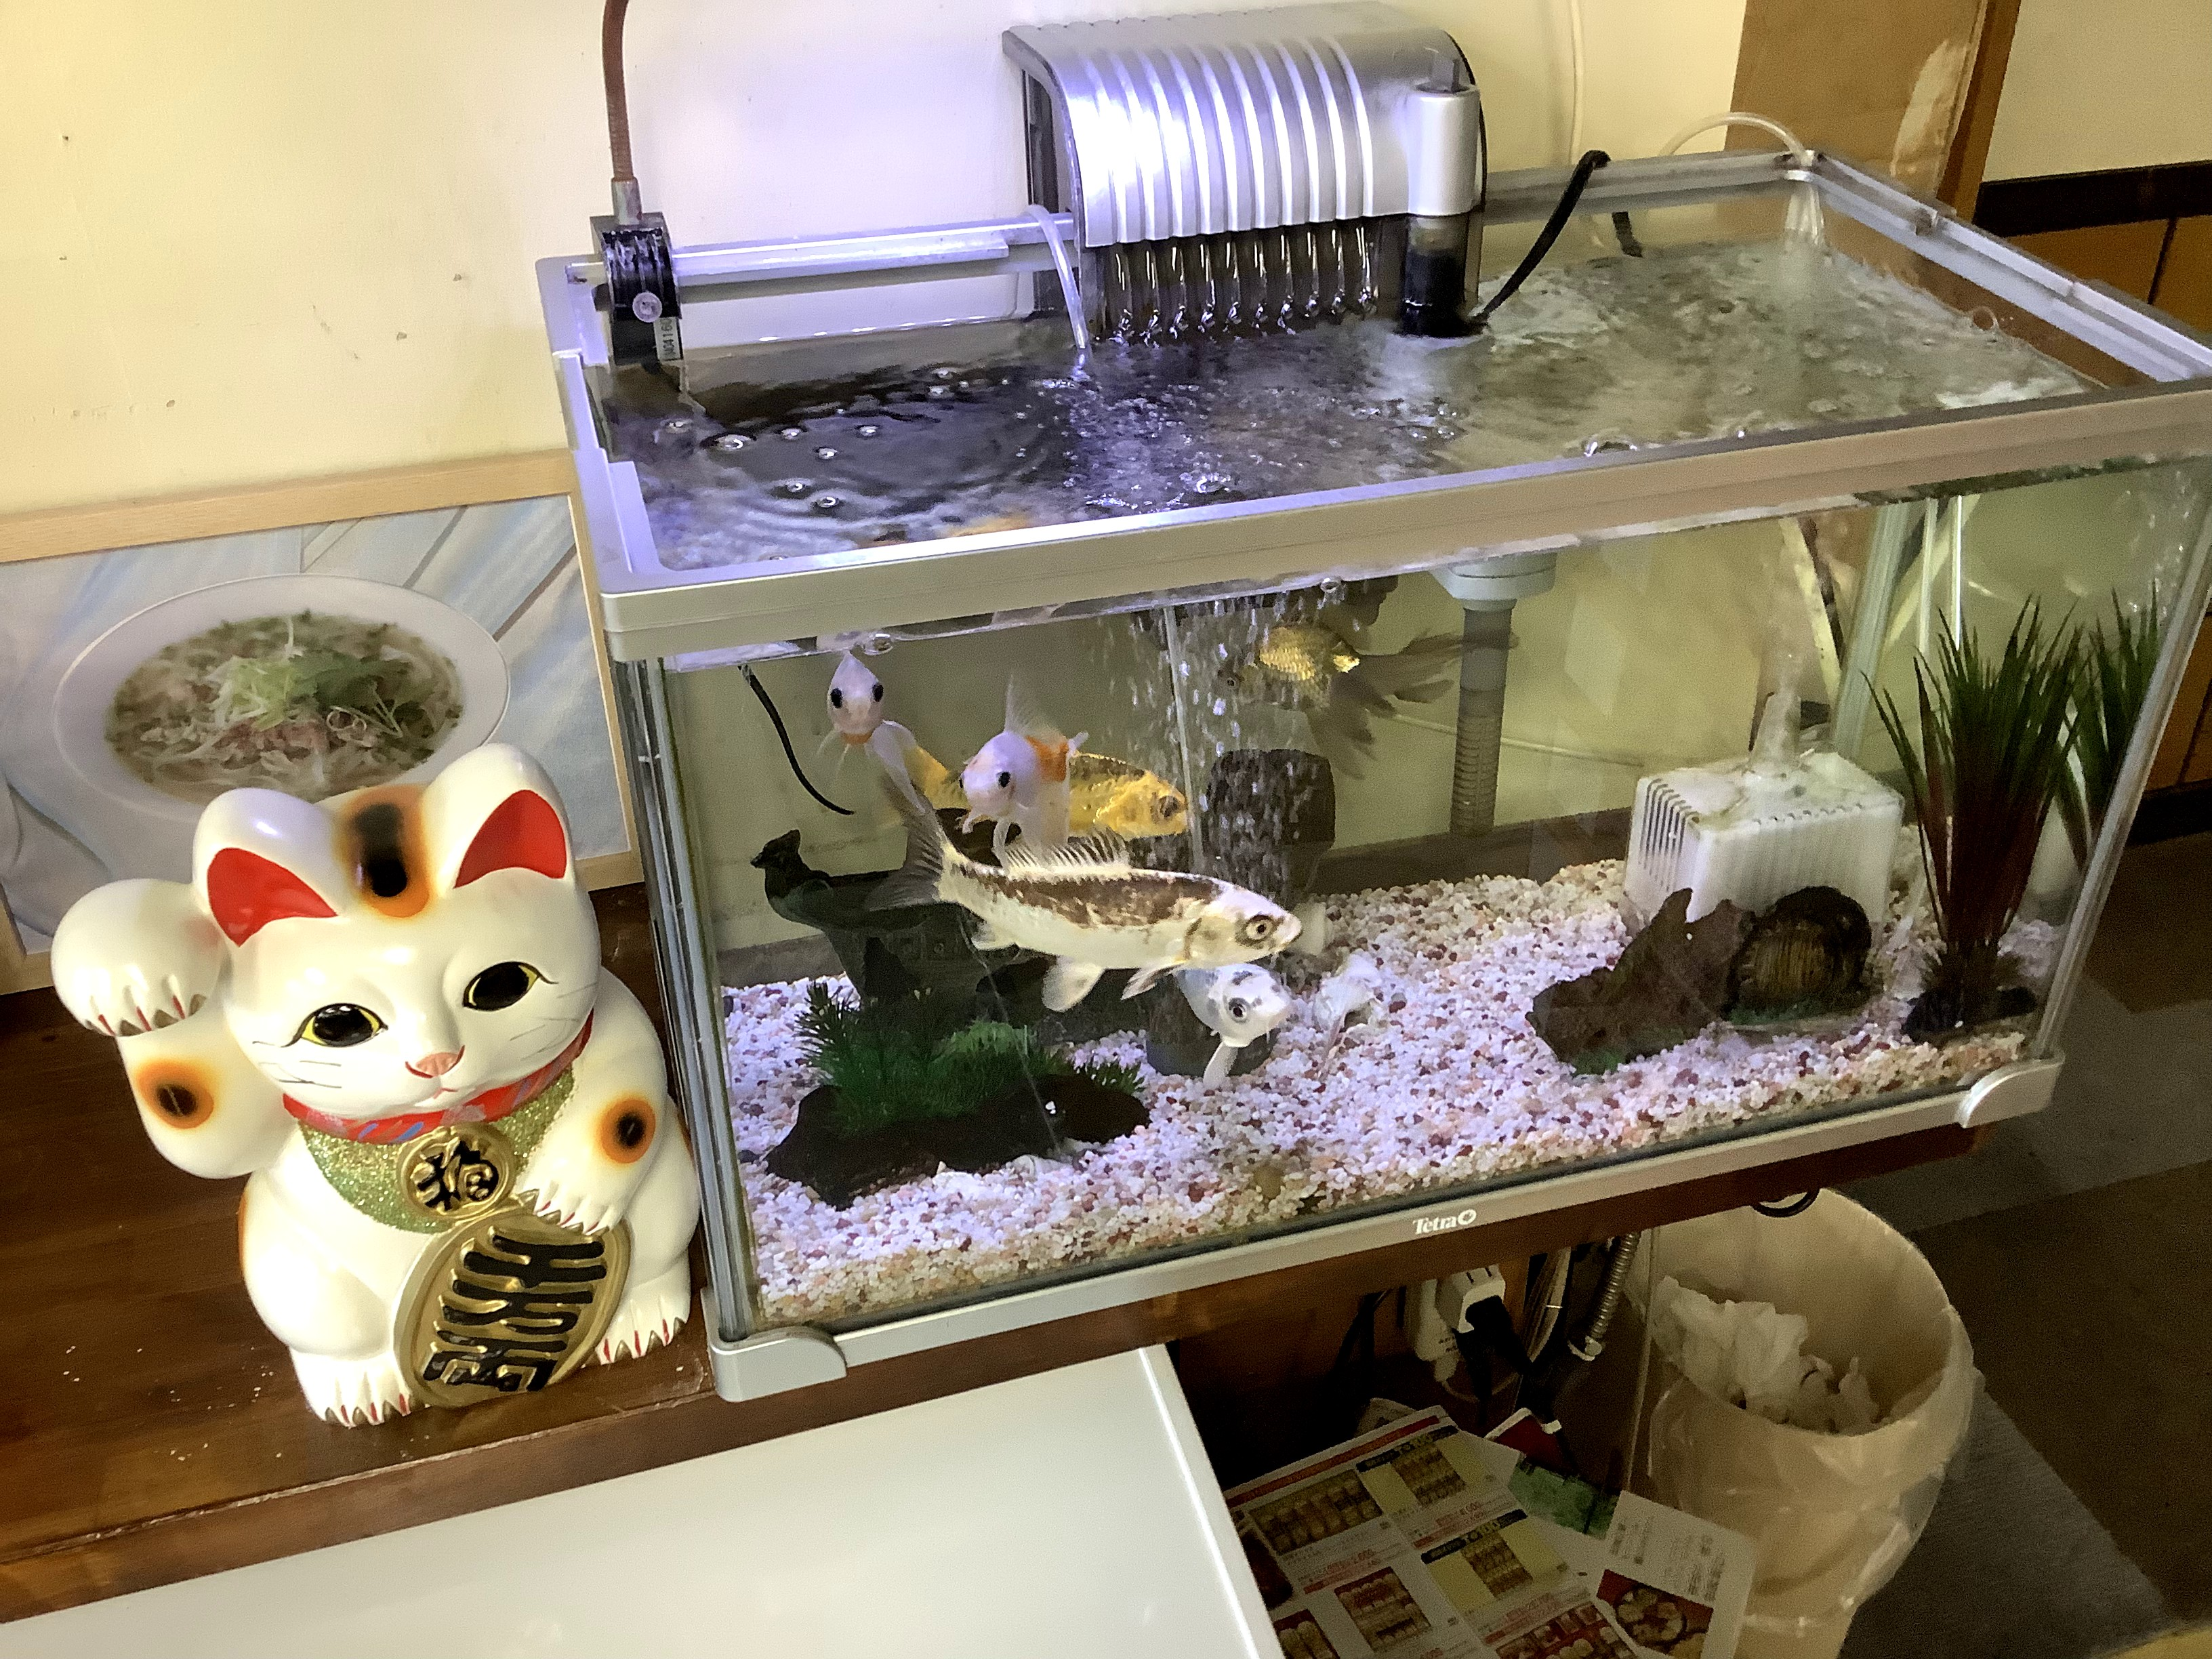 Fish kept in a restaurant